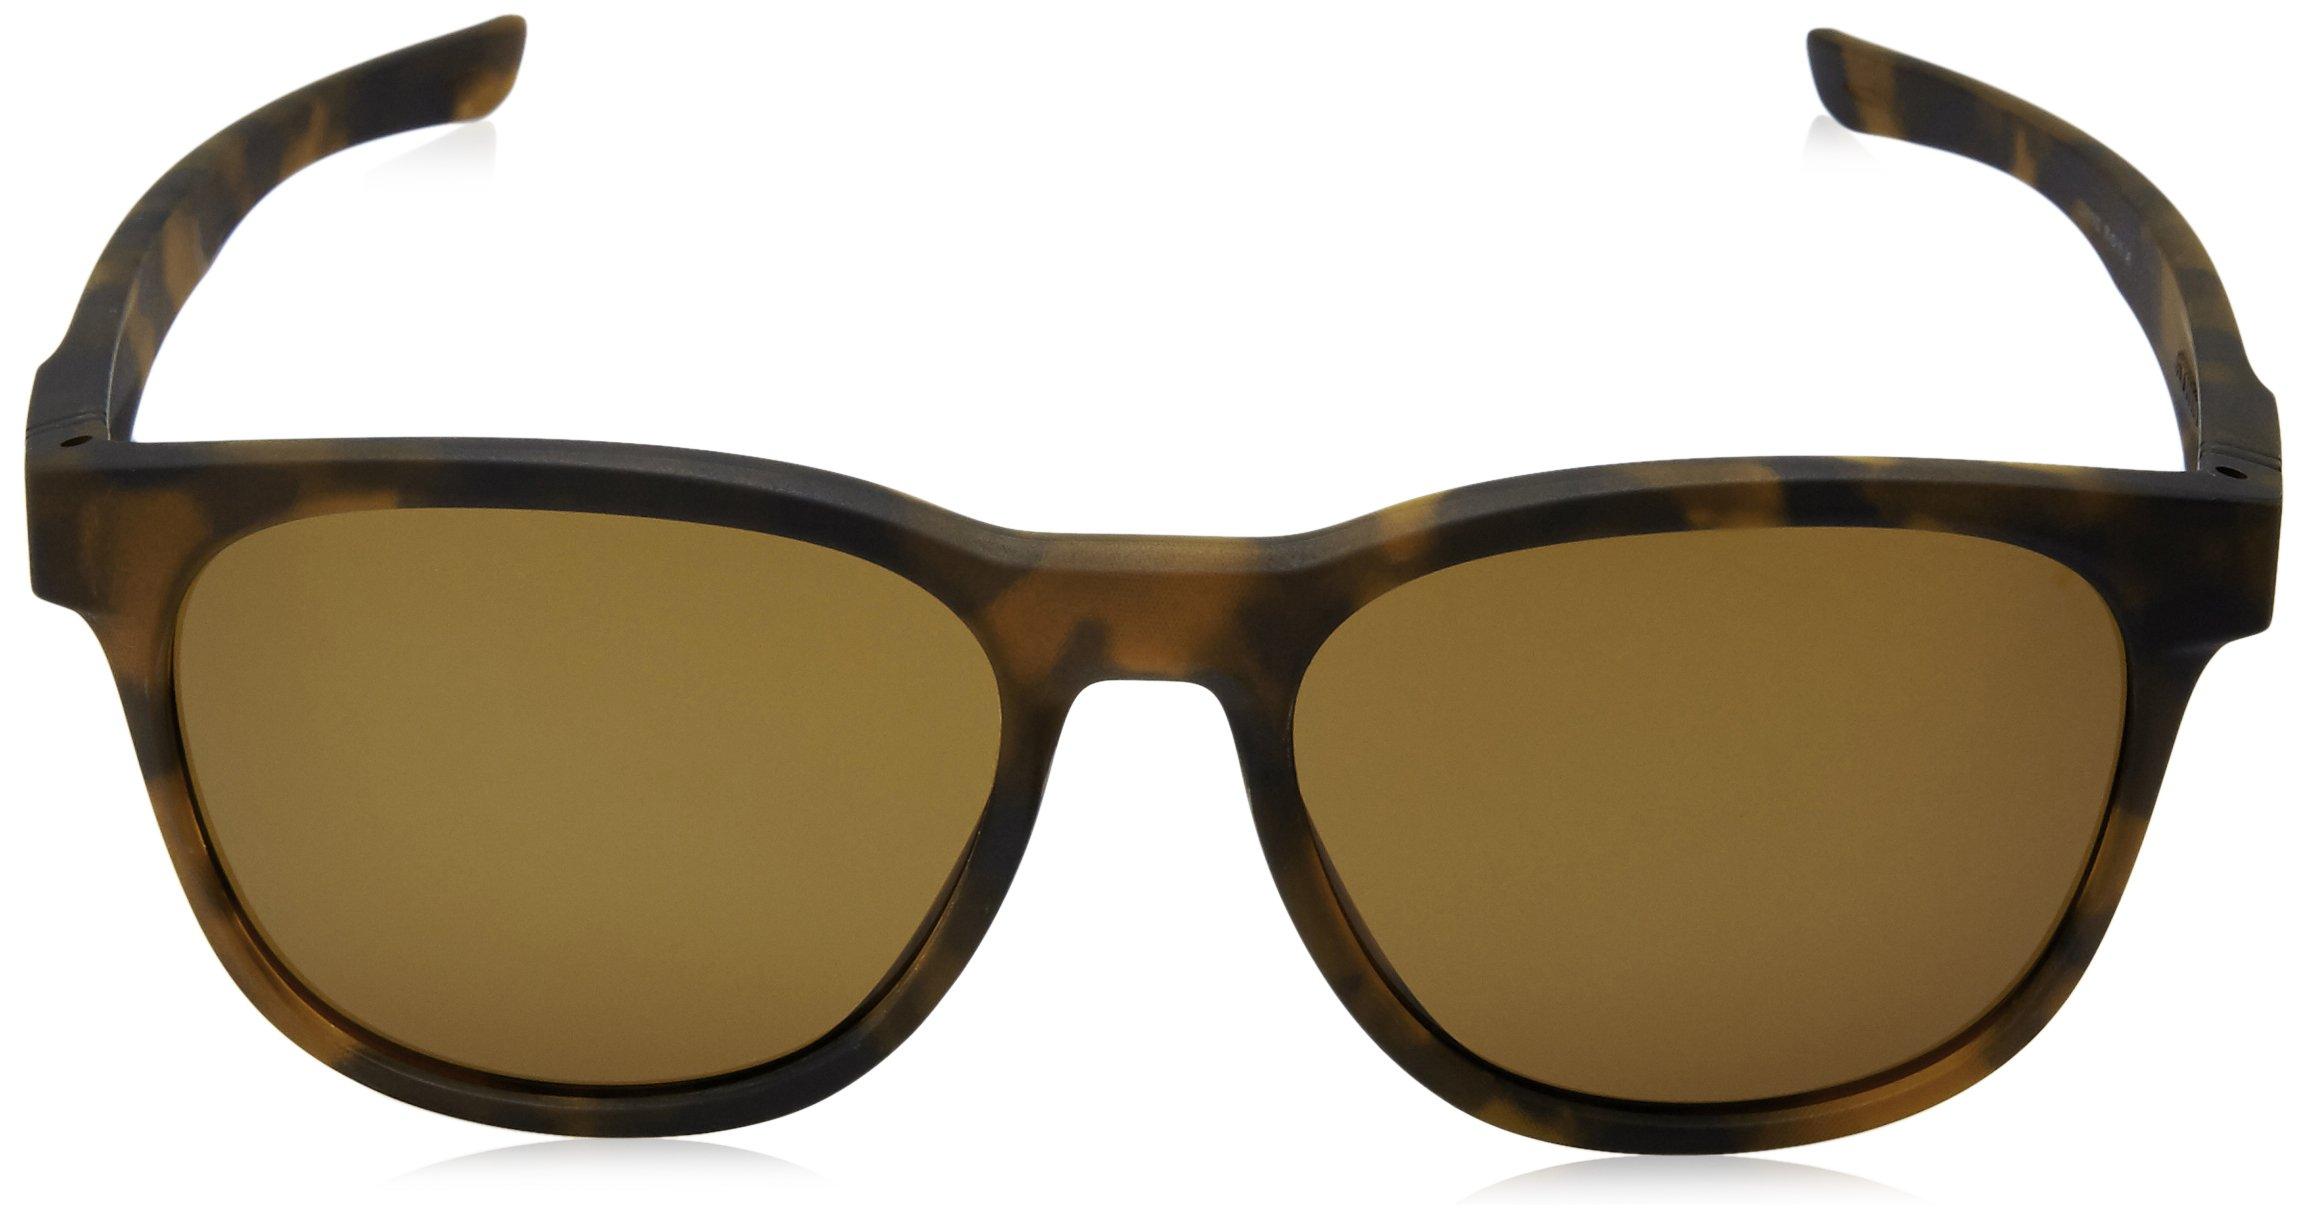 Oakley Men's Stringer Rectangular Sunglasses Matte Brown Tort w/Dark Bronze 55 mm by Oakley (Image #2)